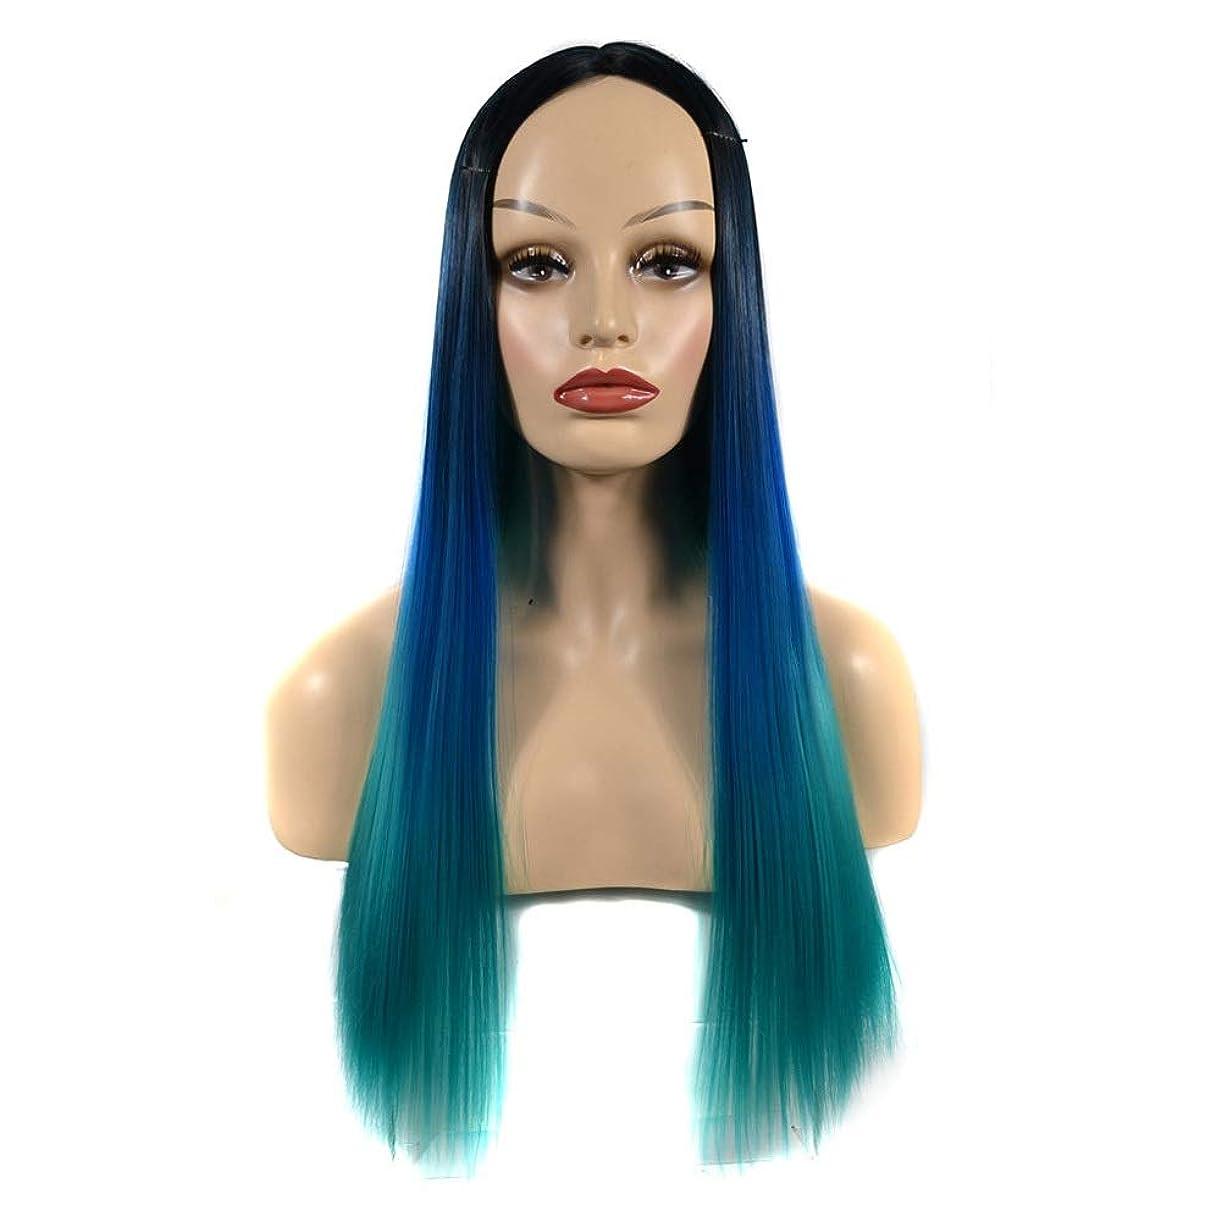 HOHYLLYA 女性のストレートフルウィッグロングピーコックグリーンヘアウィッグエレガントなレディパーティーデイリードレスパーティーウィッグ (色 : オレンジ, サイズ : 60cm)